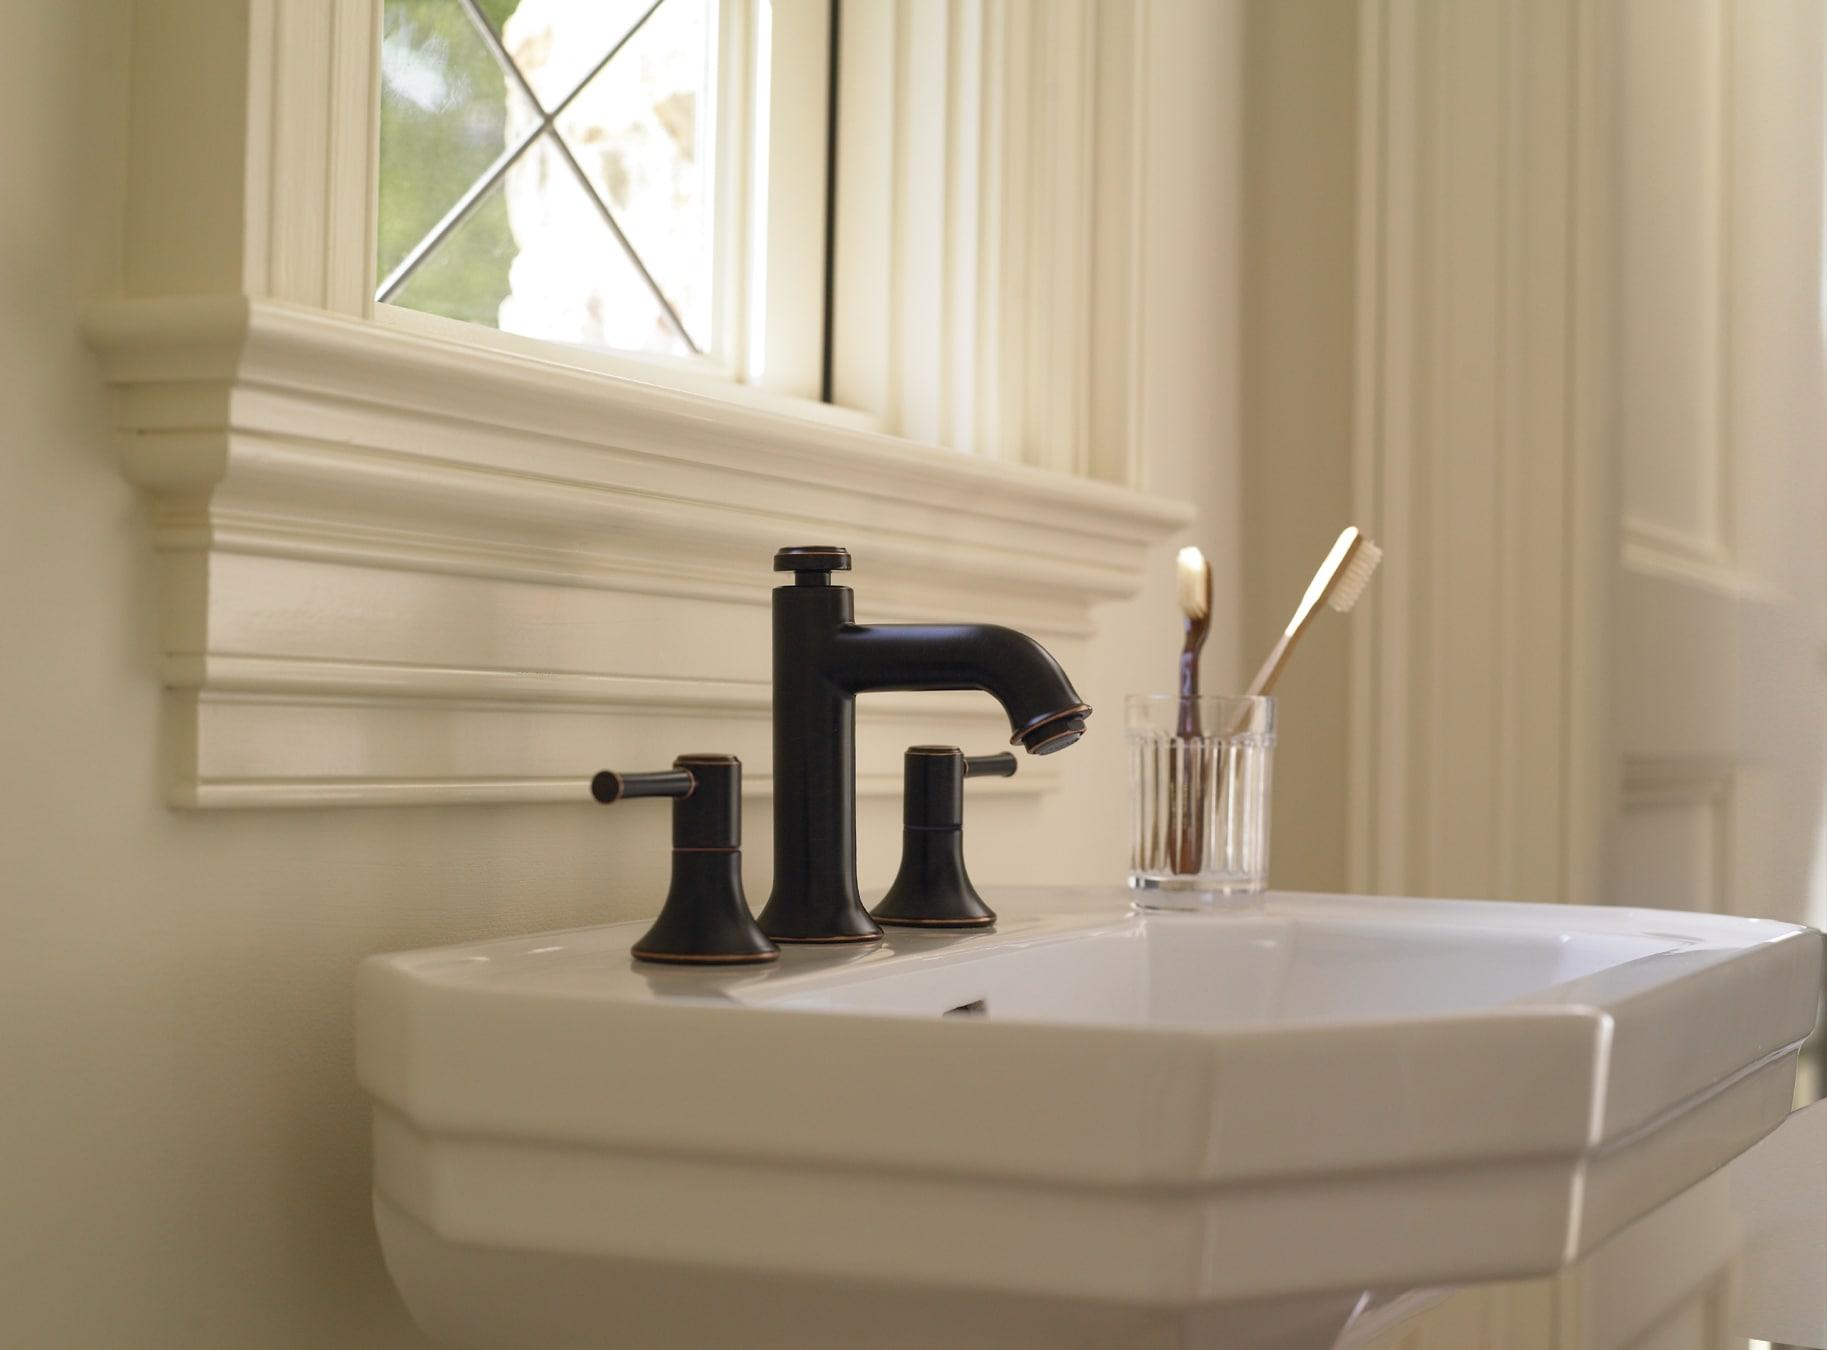 Hansgrohe 14113921 Rubbed Bronze Talis C 1.2 GPM Widespread Bathroom ...